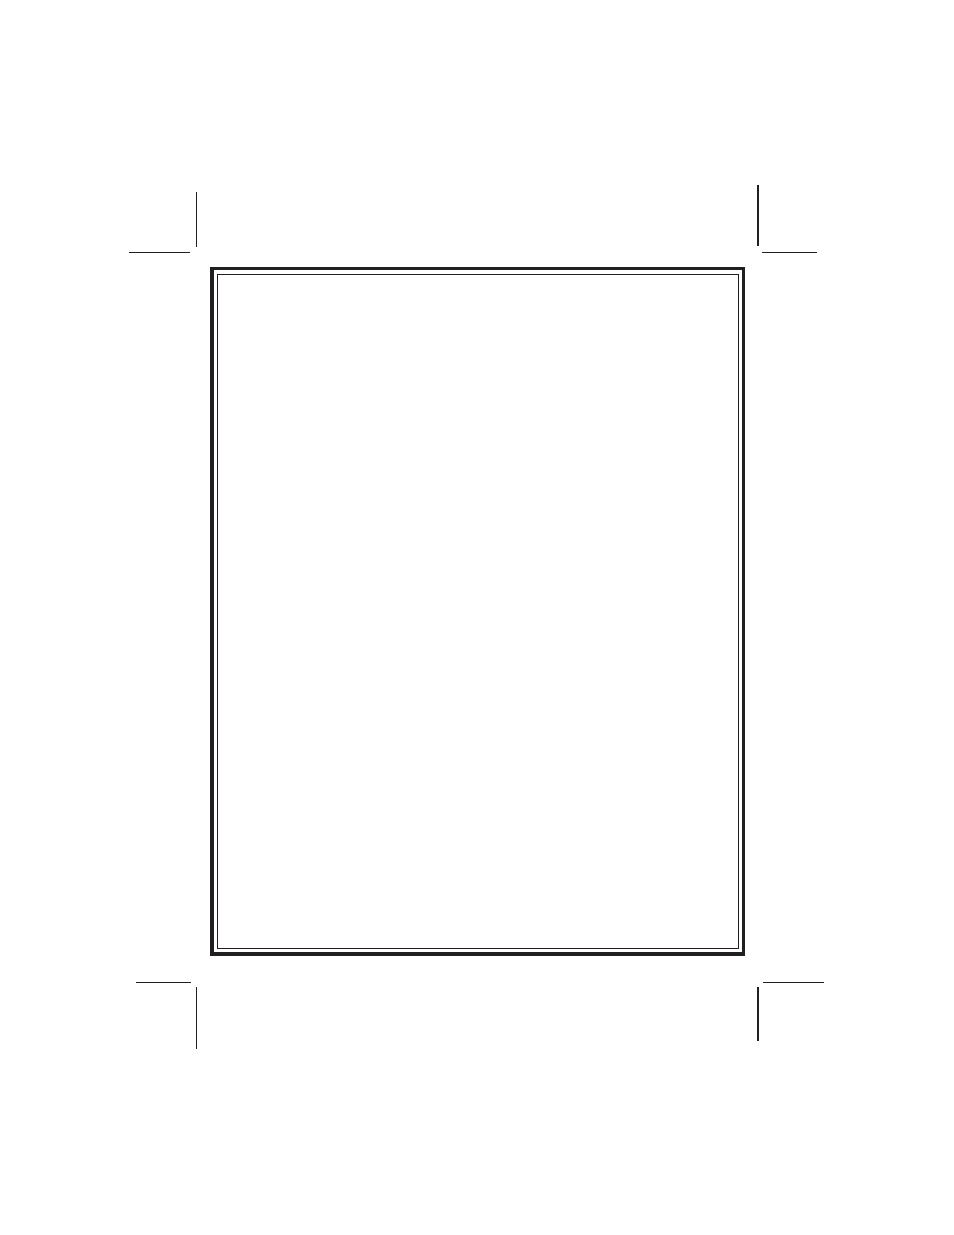 code alarm ca611 user manual page 6 13 rh manualsdir com